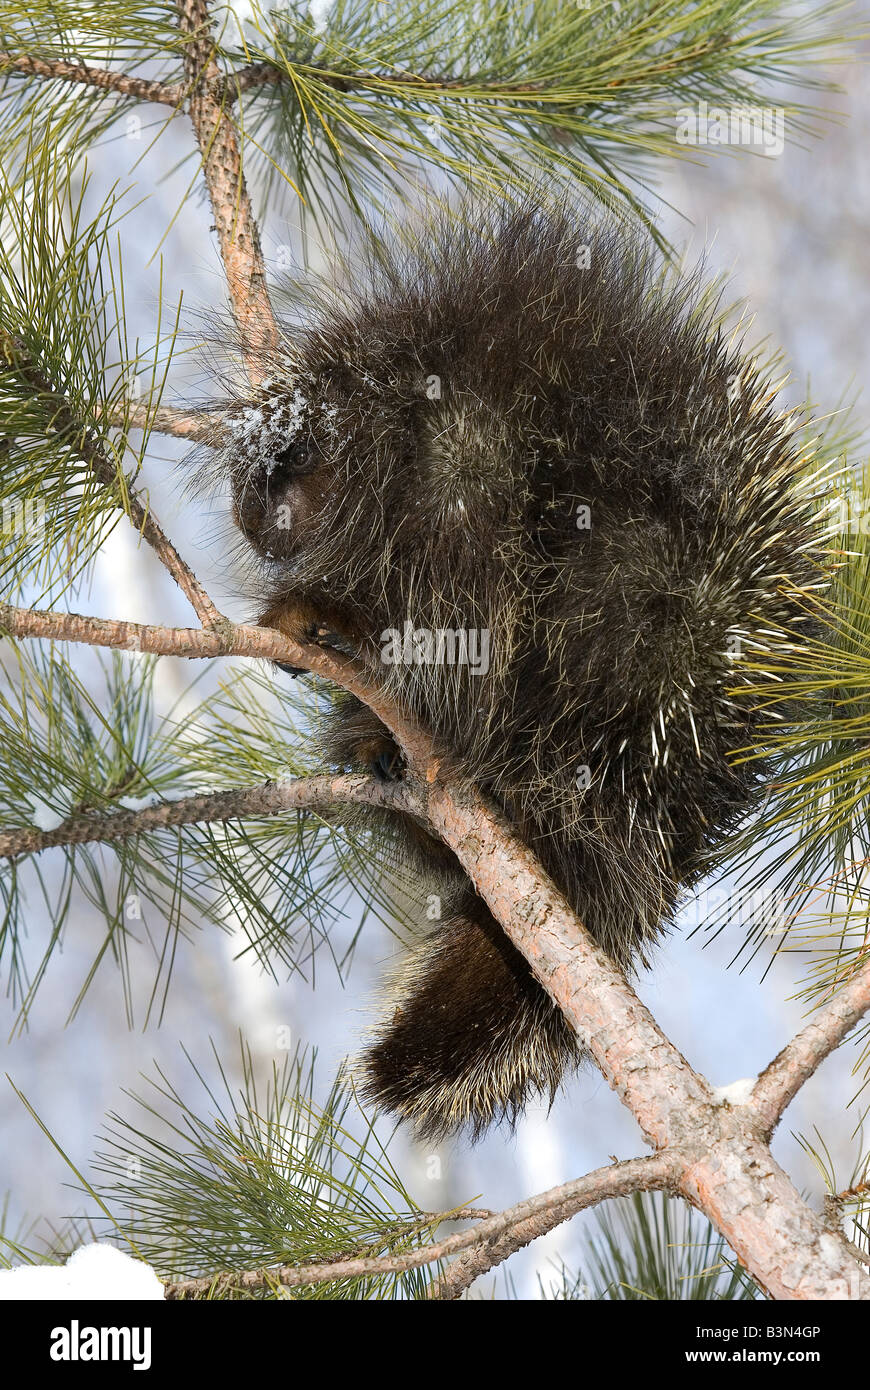 Porcupine Erethizon dorsatum in Pine Tree North America Stock Photo